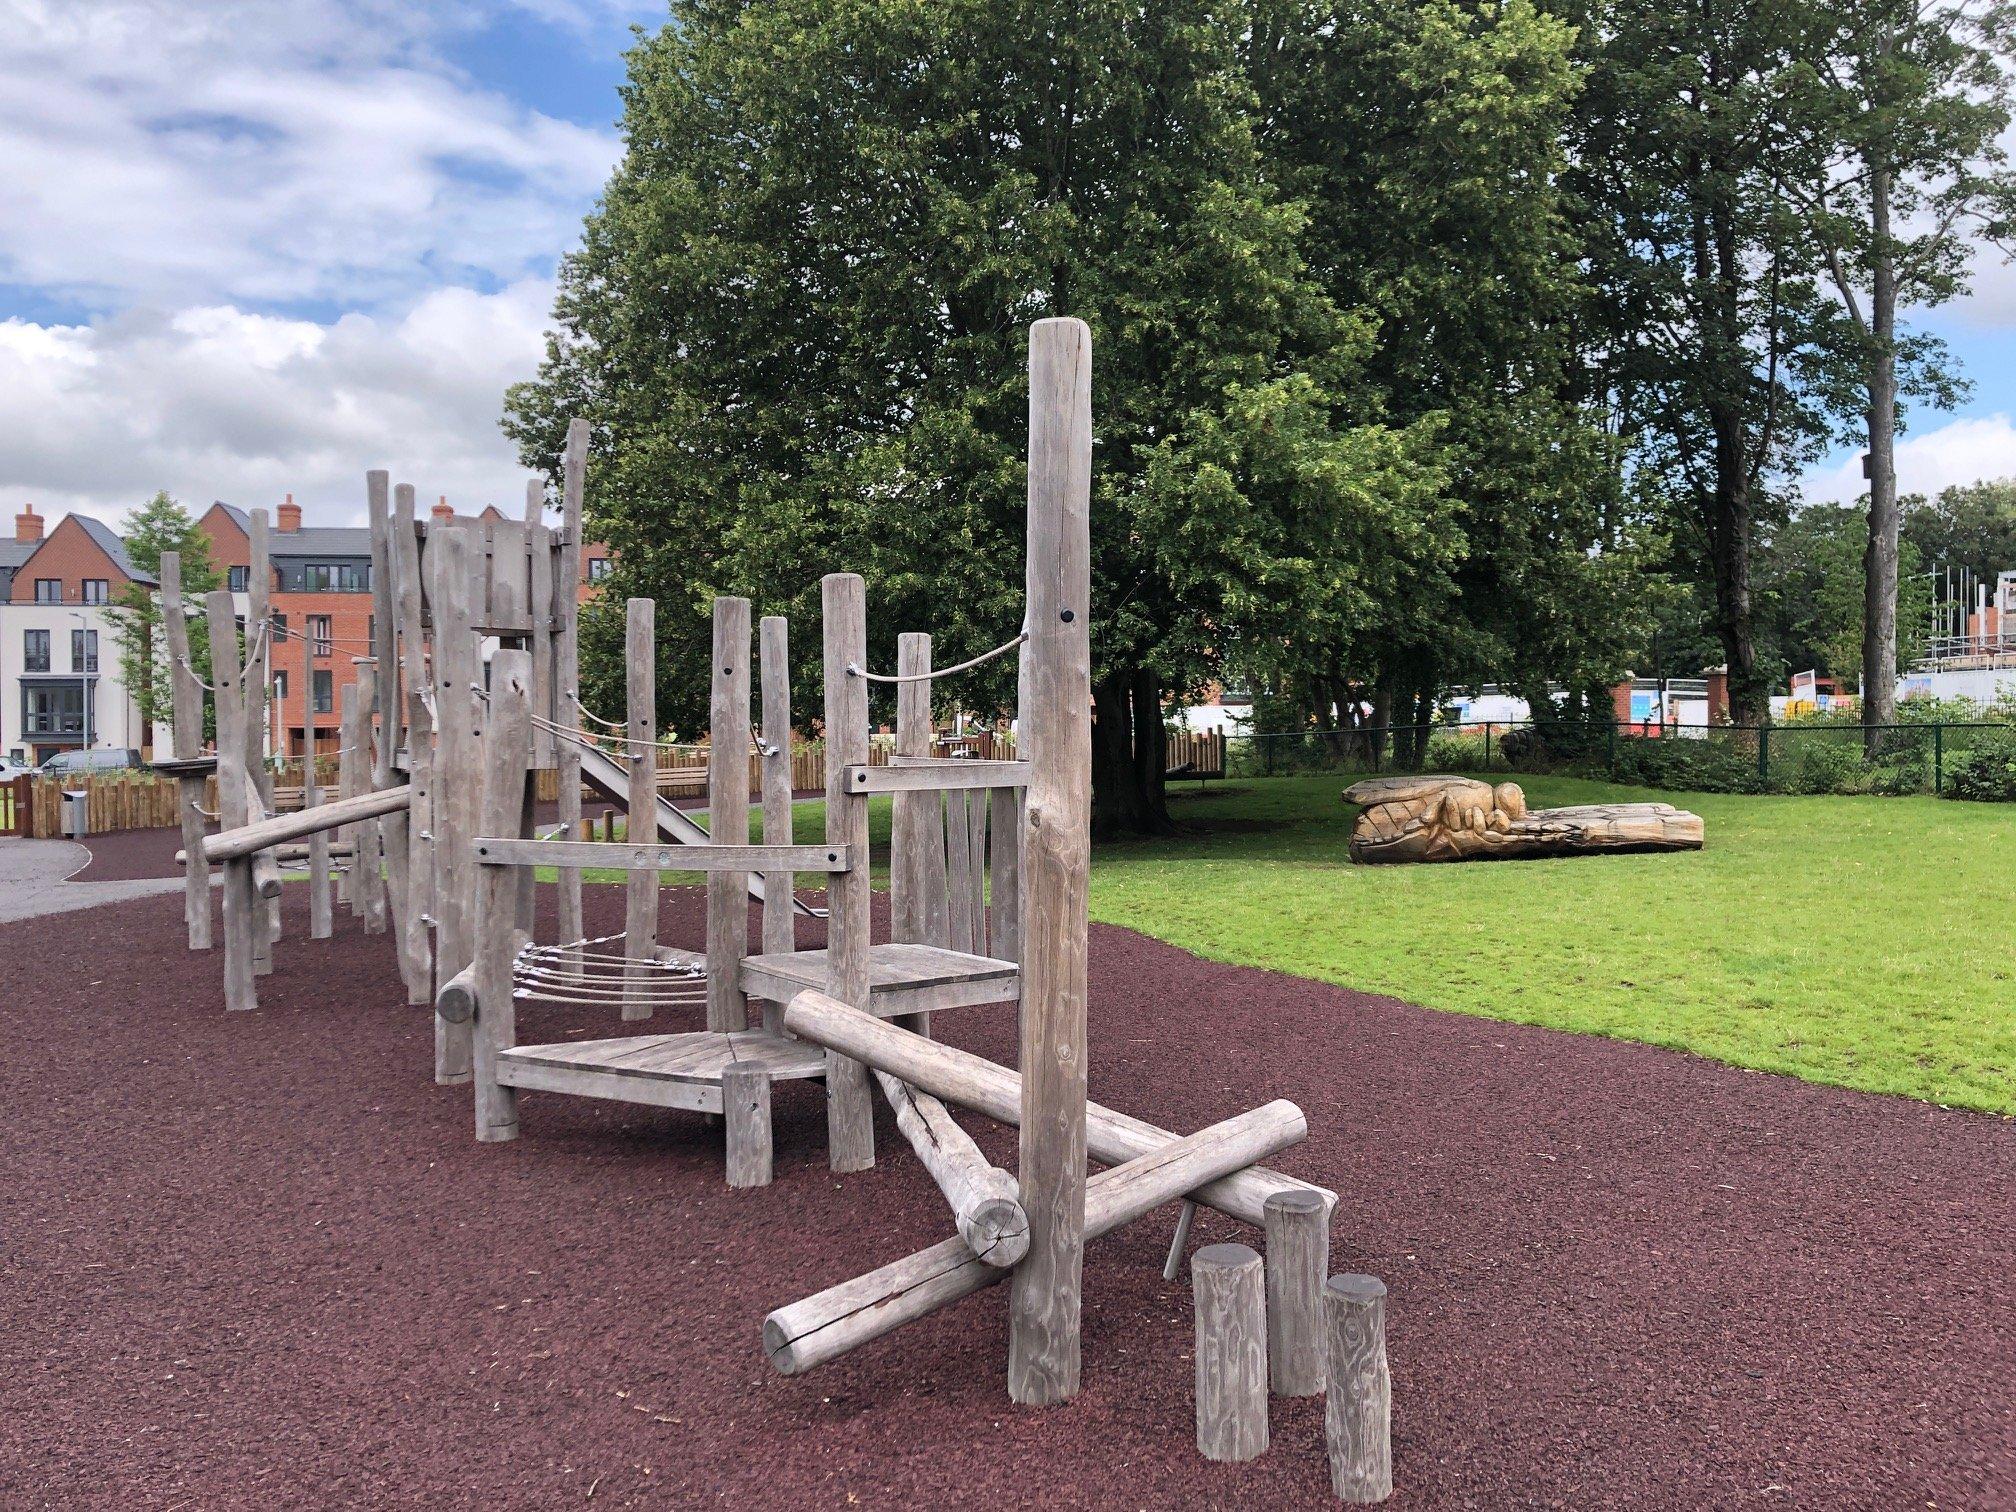 Elms Field Play Area and Park Wokingham